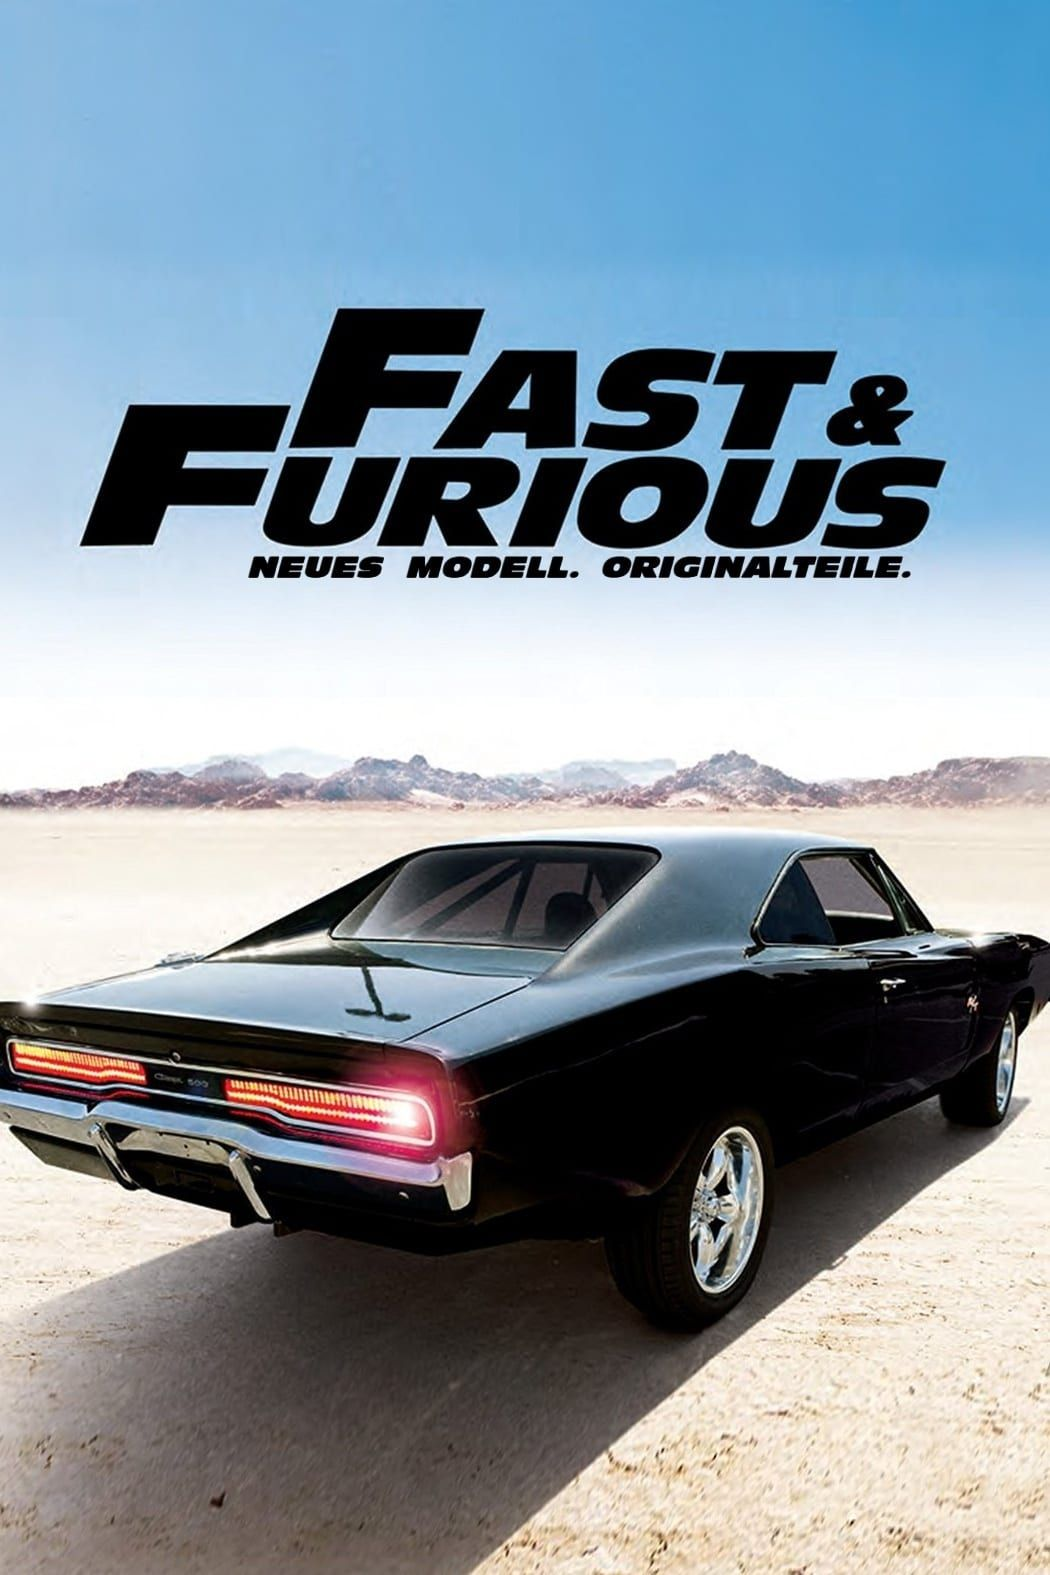 Fast And Furious Poster High Quality Hd Printable Wallpapers 2009 Doms Cars Carros E Caminhoes Velozes E Furiosos Auto